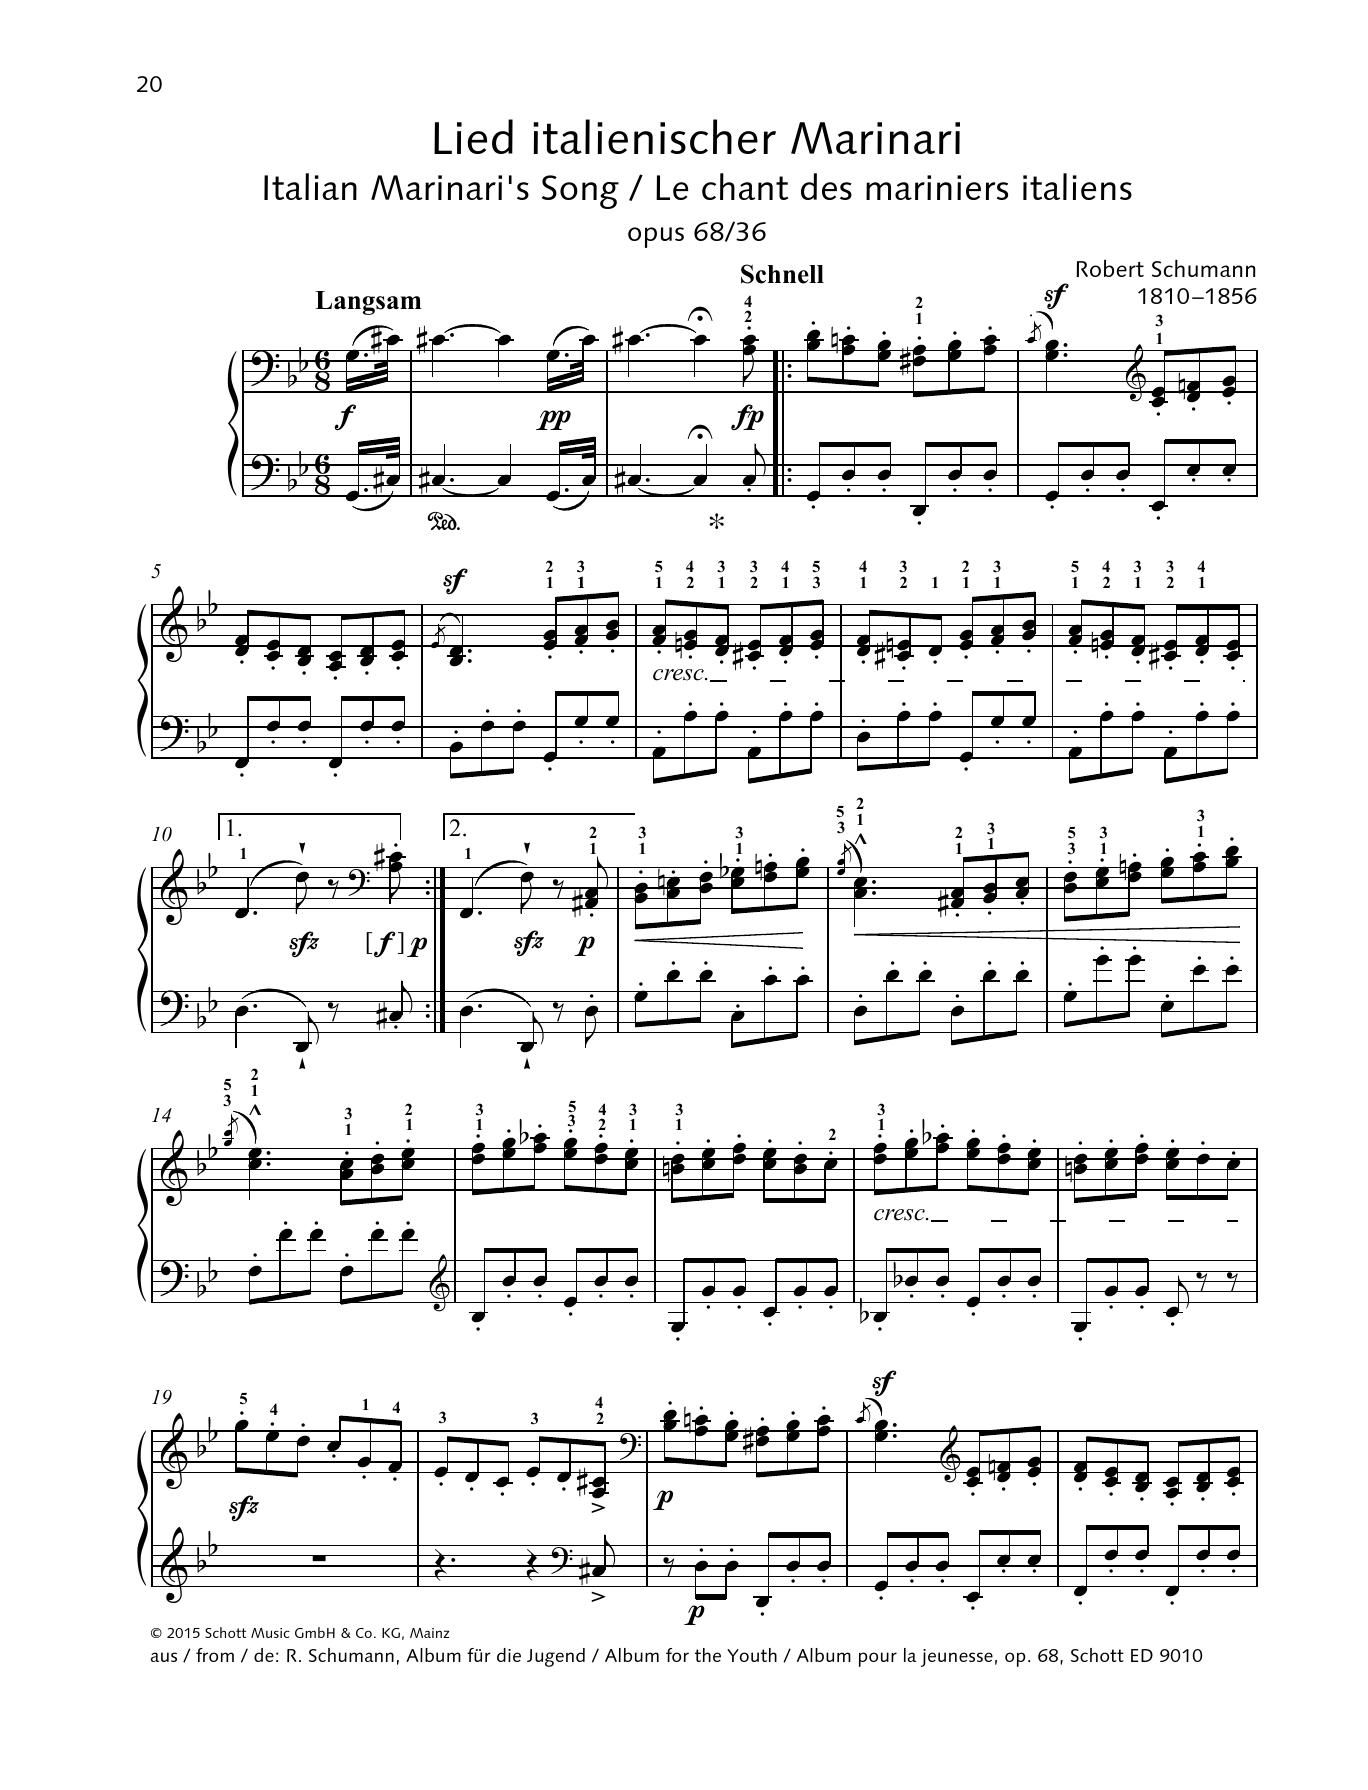 Italian Marinari's Song Sheet Music